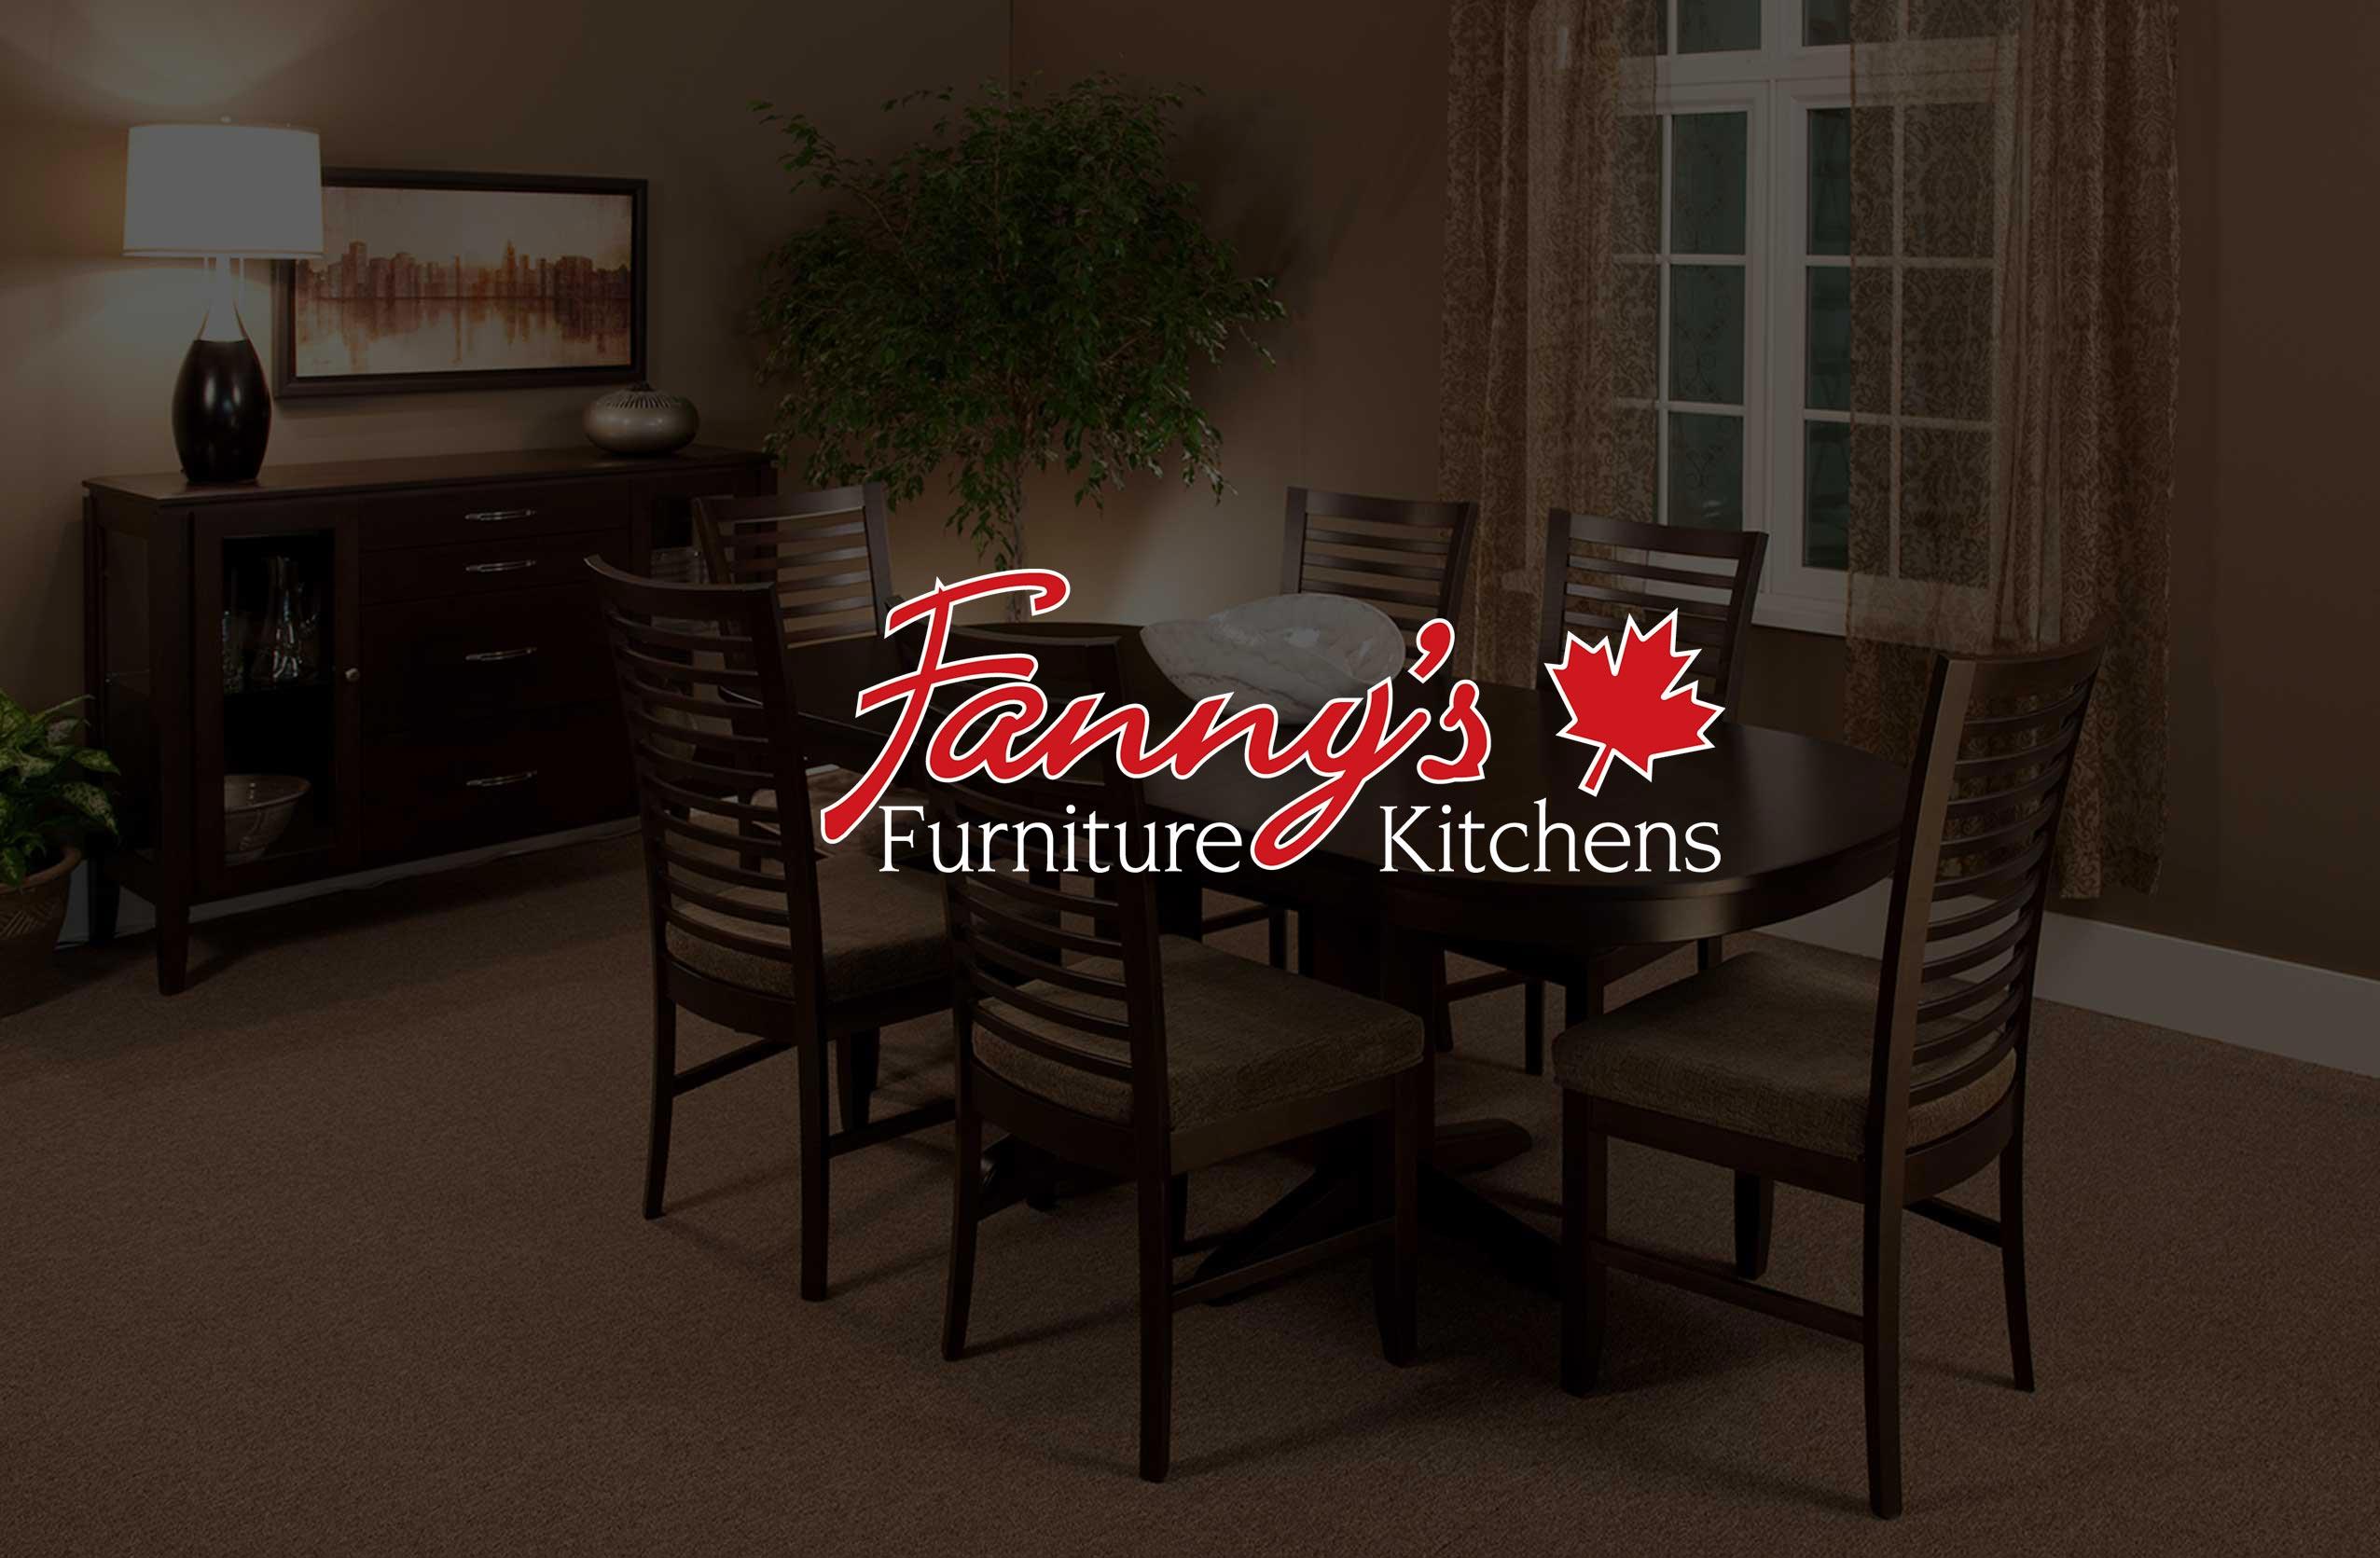 Background-Fannys